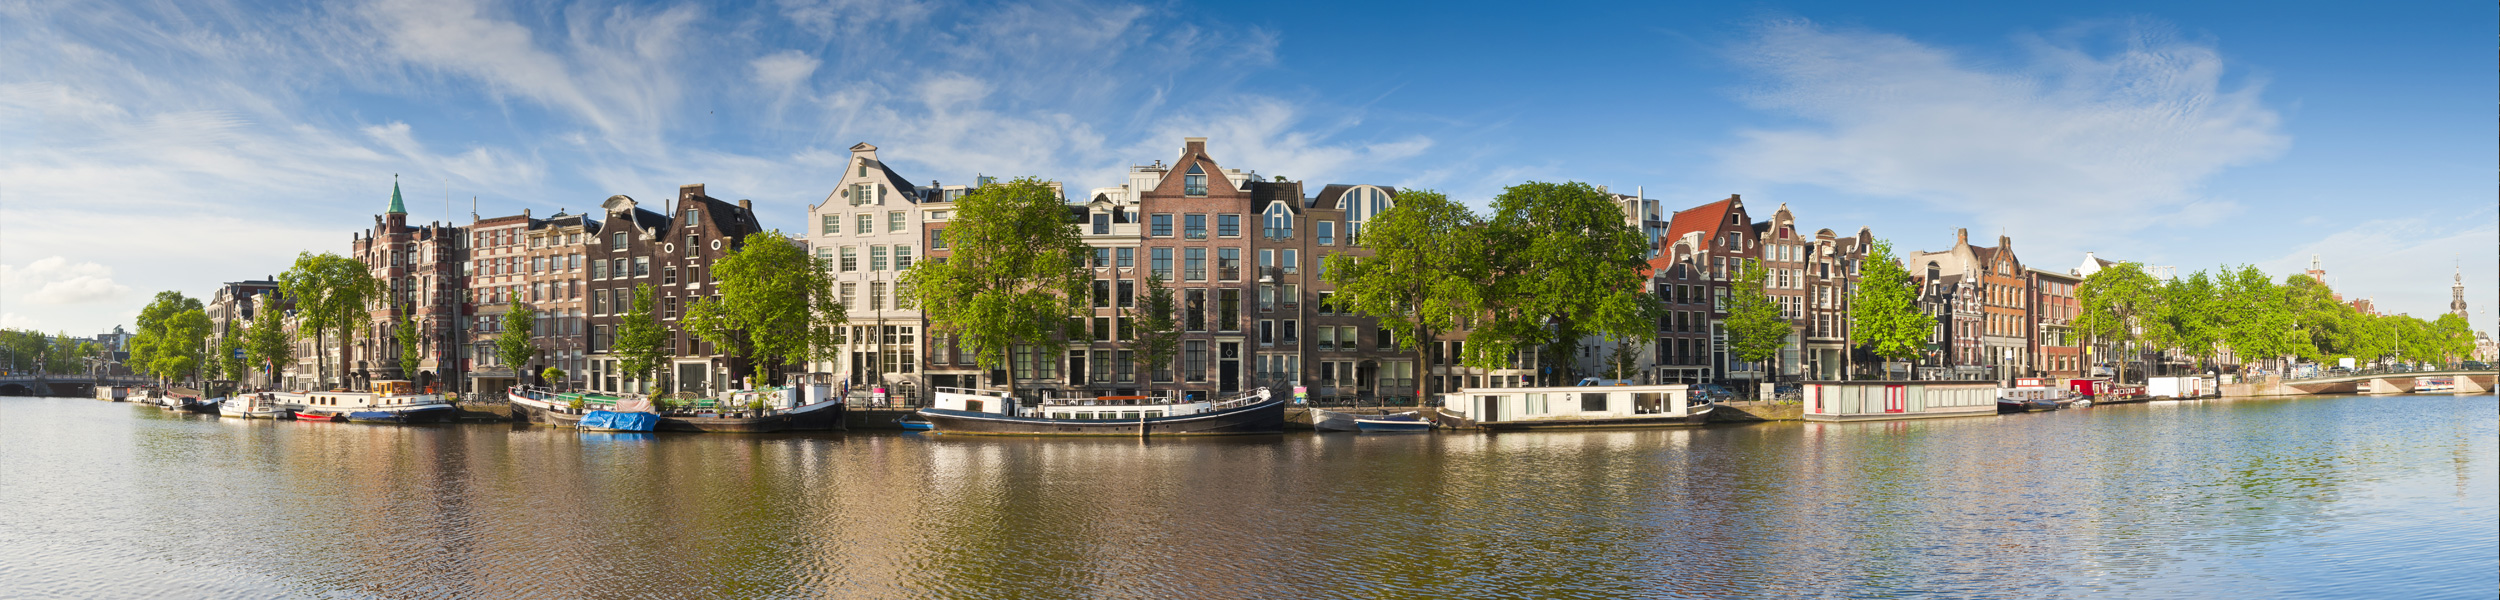 Java Expert Amsterdam, the Netherlands